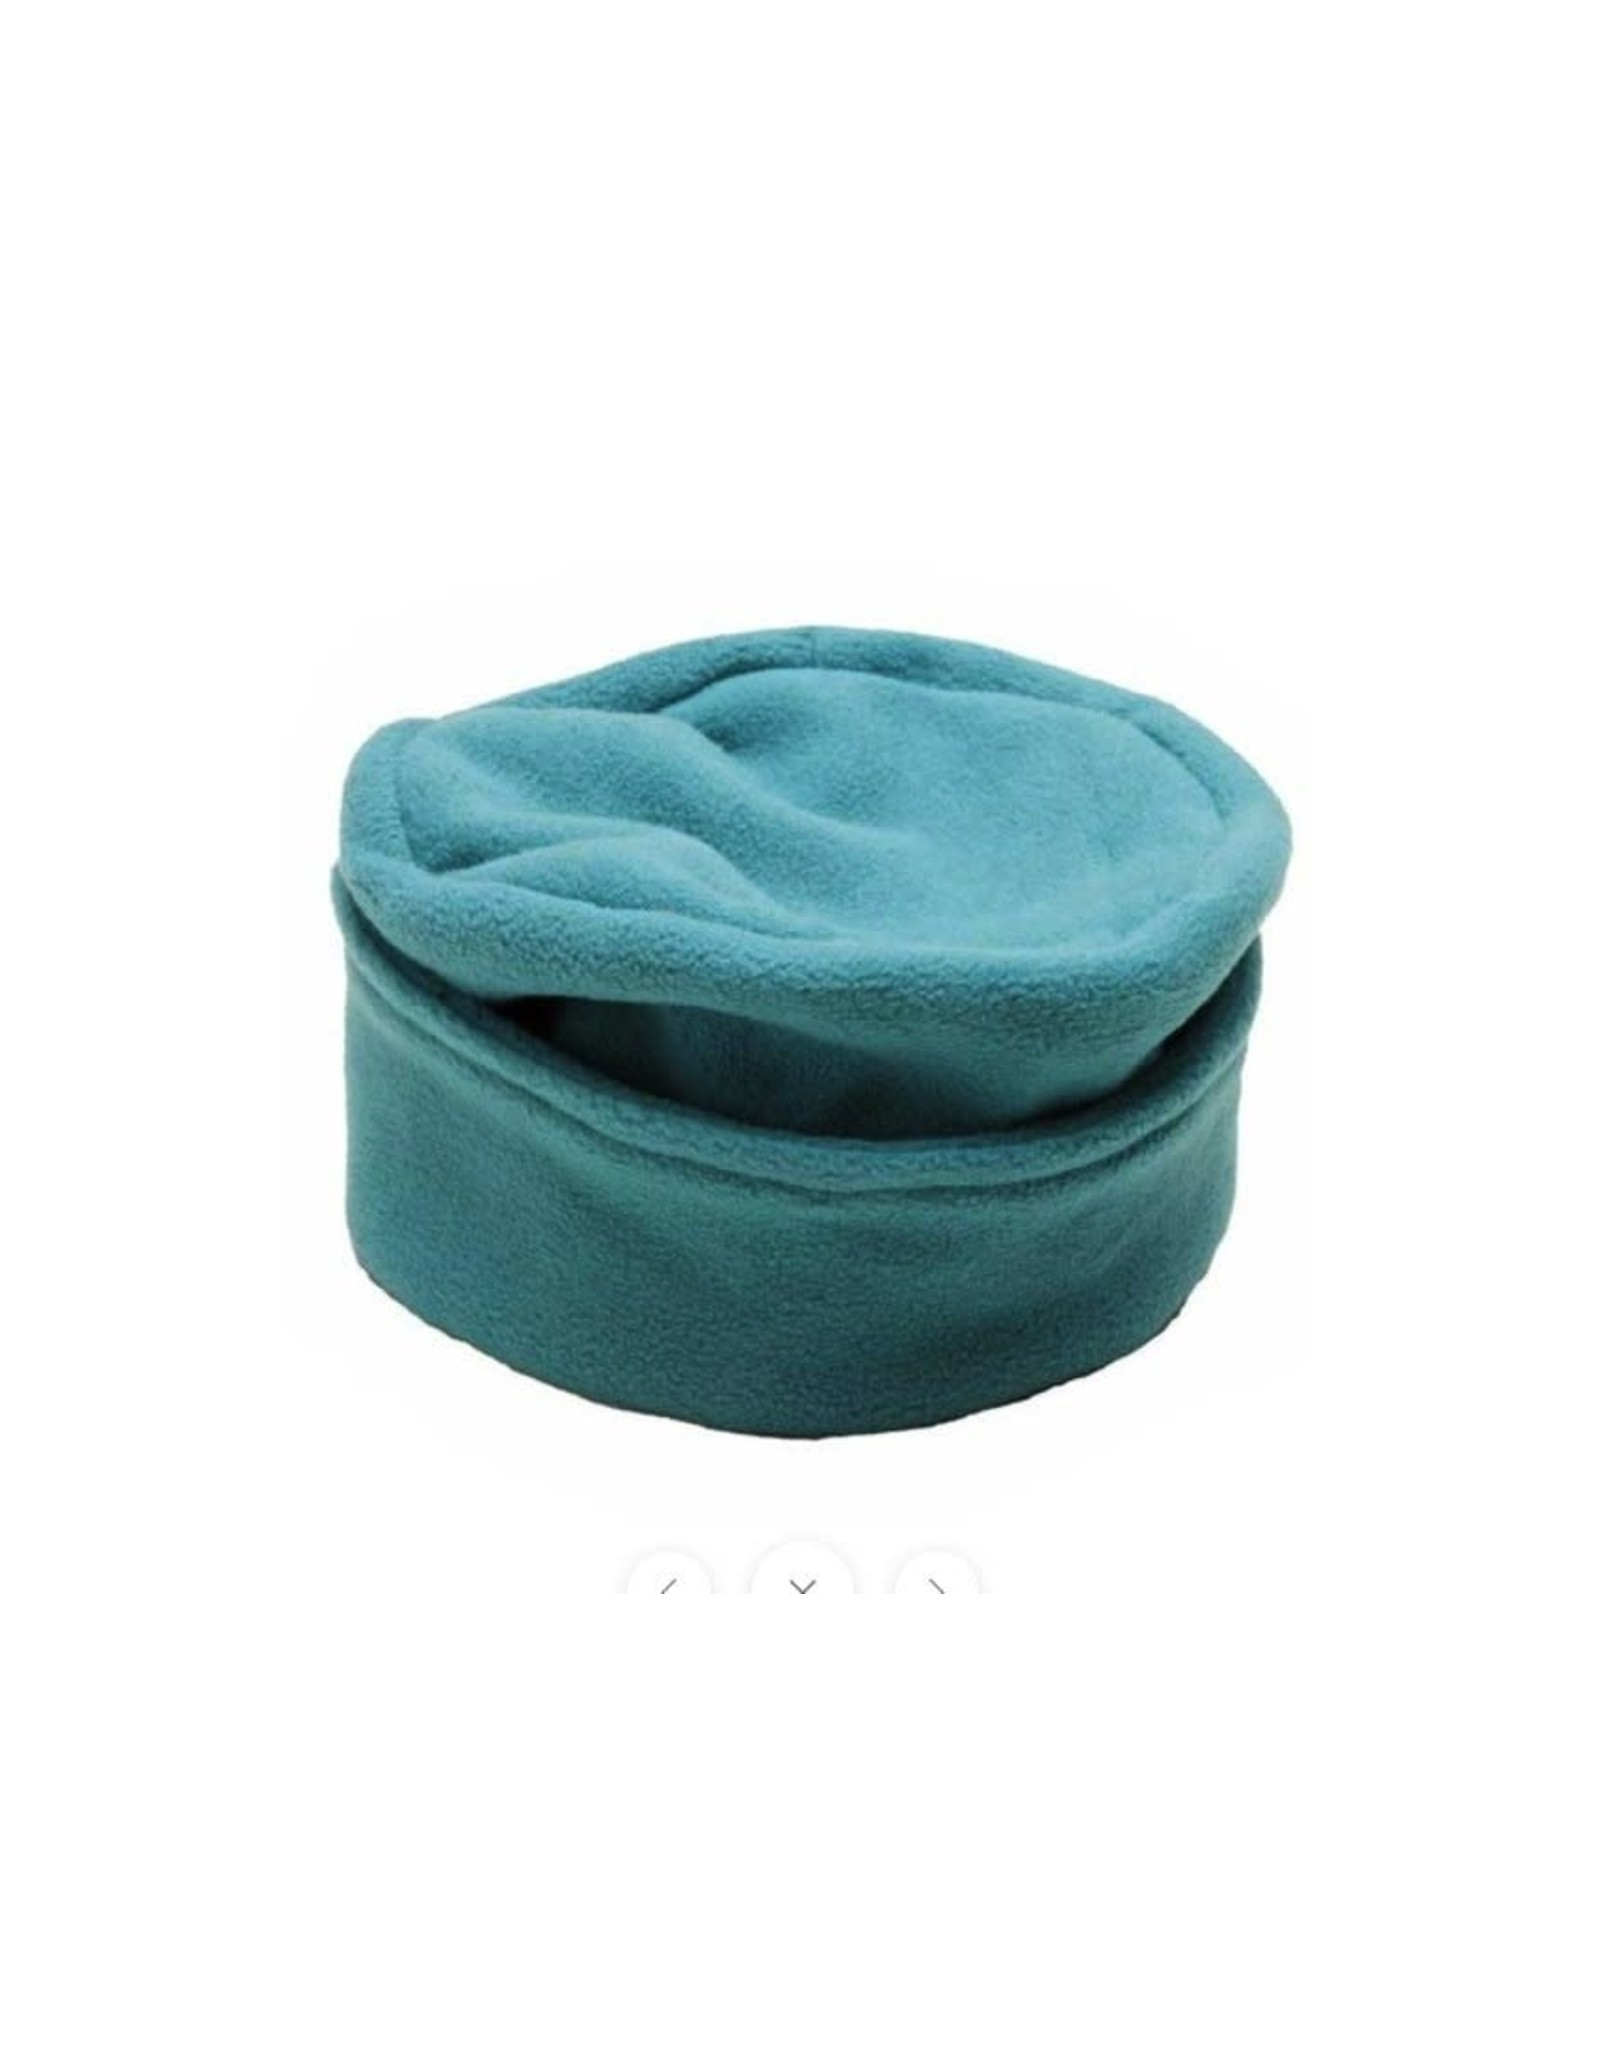 Fleece Hat w/ Flat Top, Turquoise, Nepal